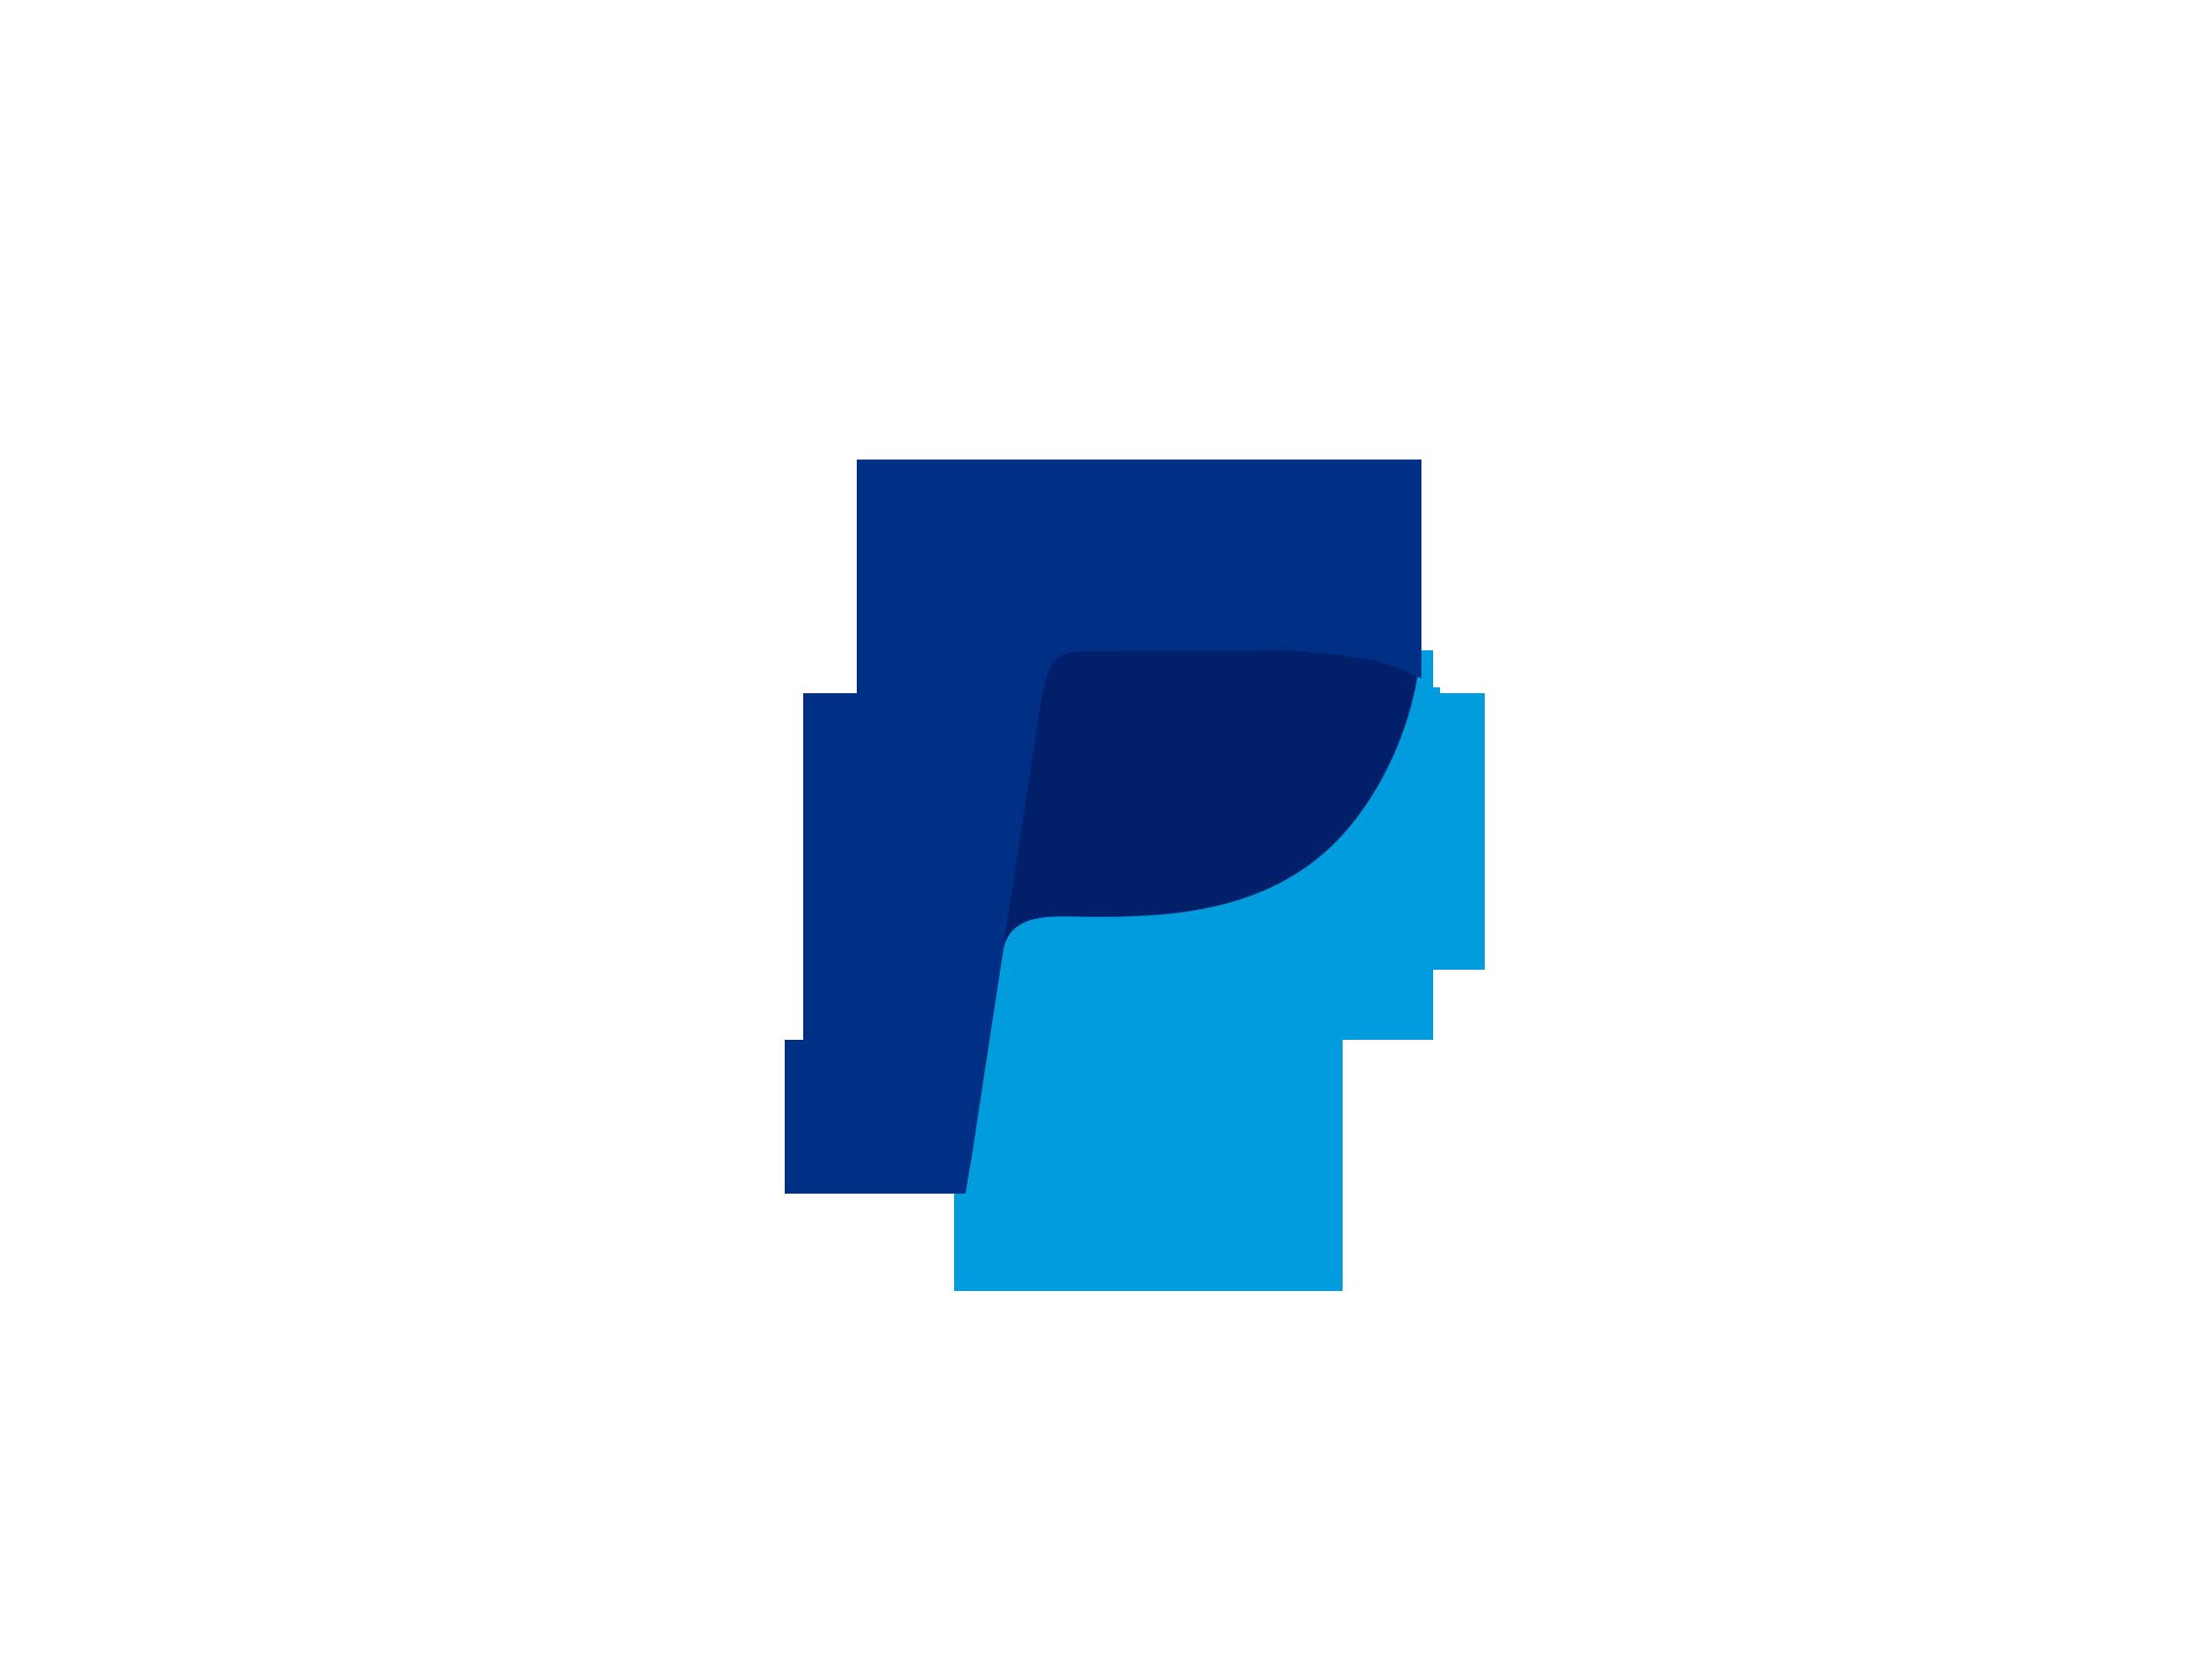 paypal-logo-png-small-1